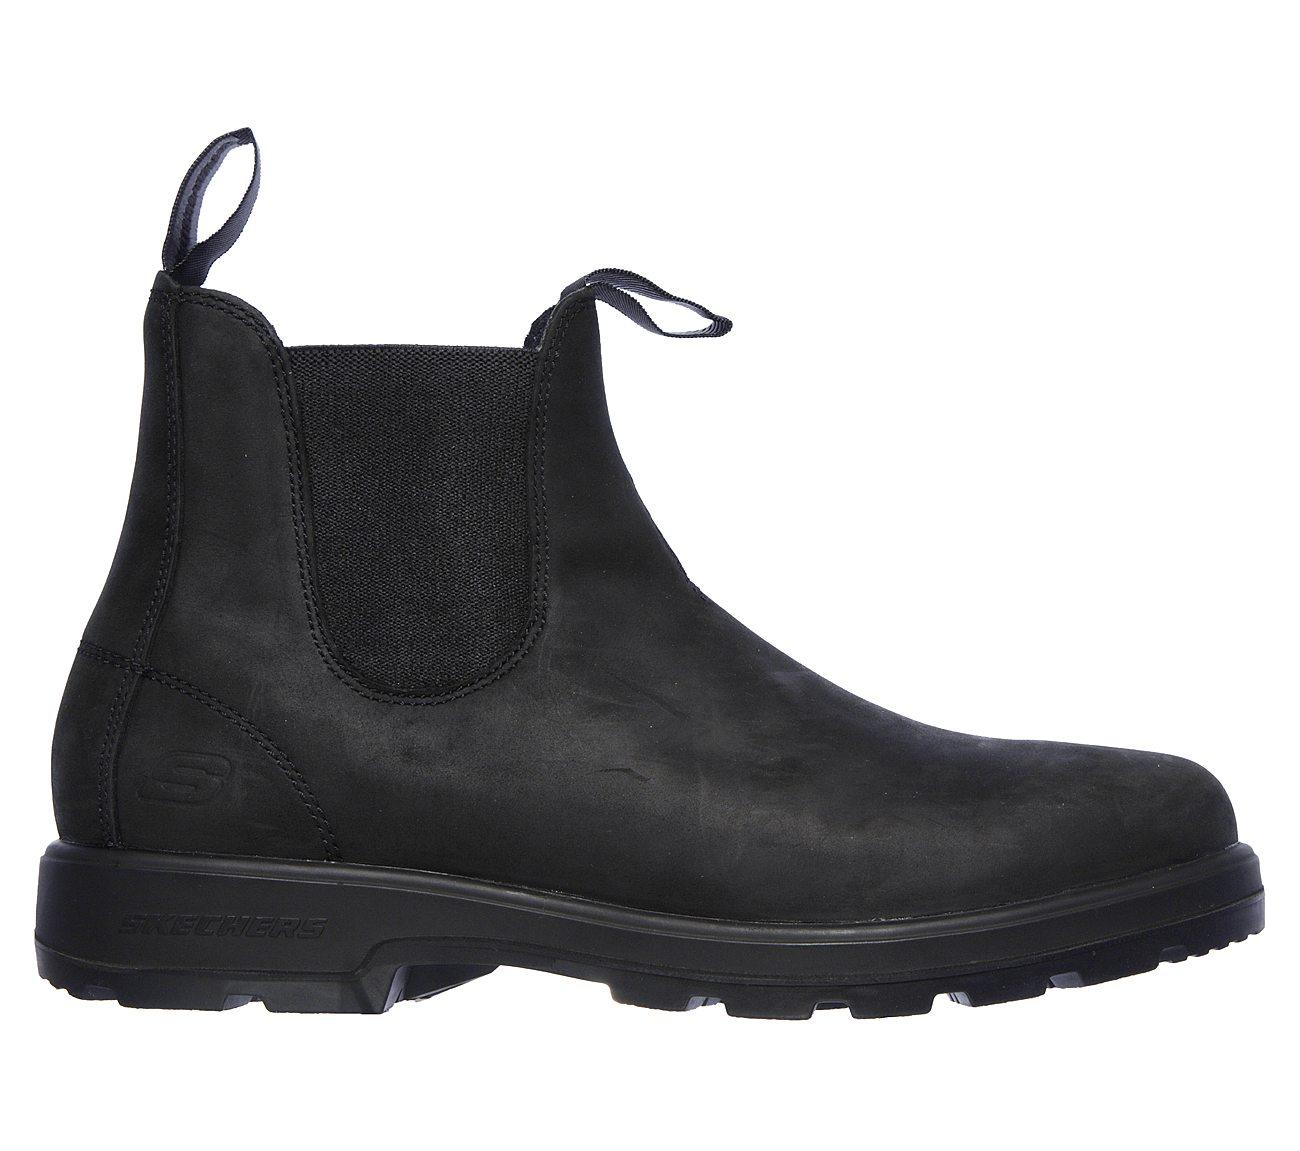 Skechers Skech Air Droven Malten Slip On Shoe Men's Size 10.5 Black | eBay